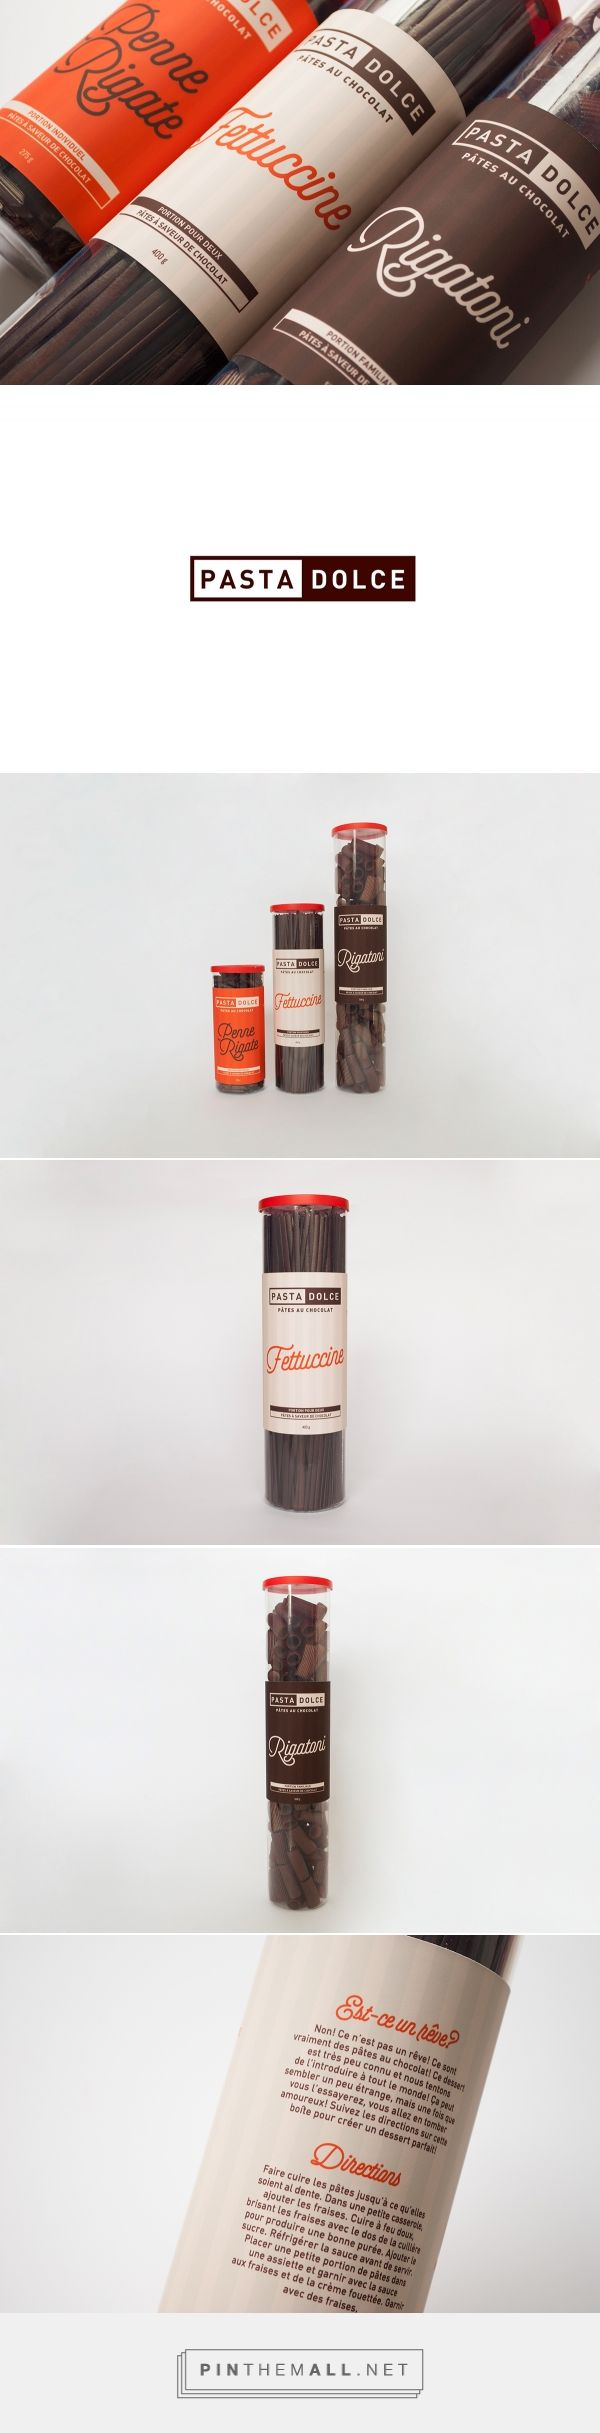 Pasta Dolce Packaging on Behance https://www.behance.net/gallery/26269511/Pasta-Dolce-Packaging - created via http://pinthemall.net